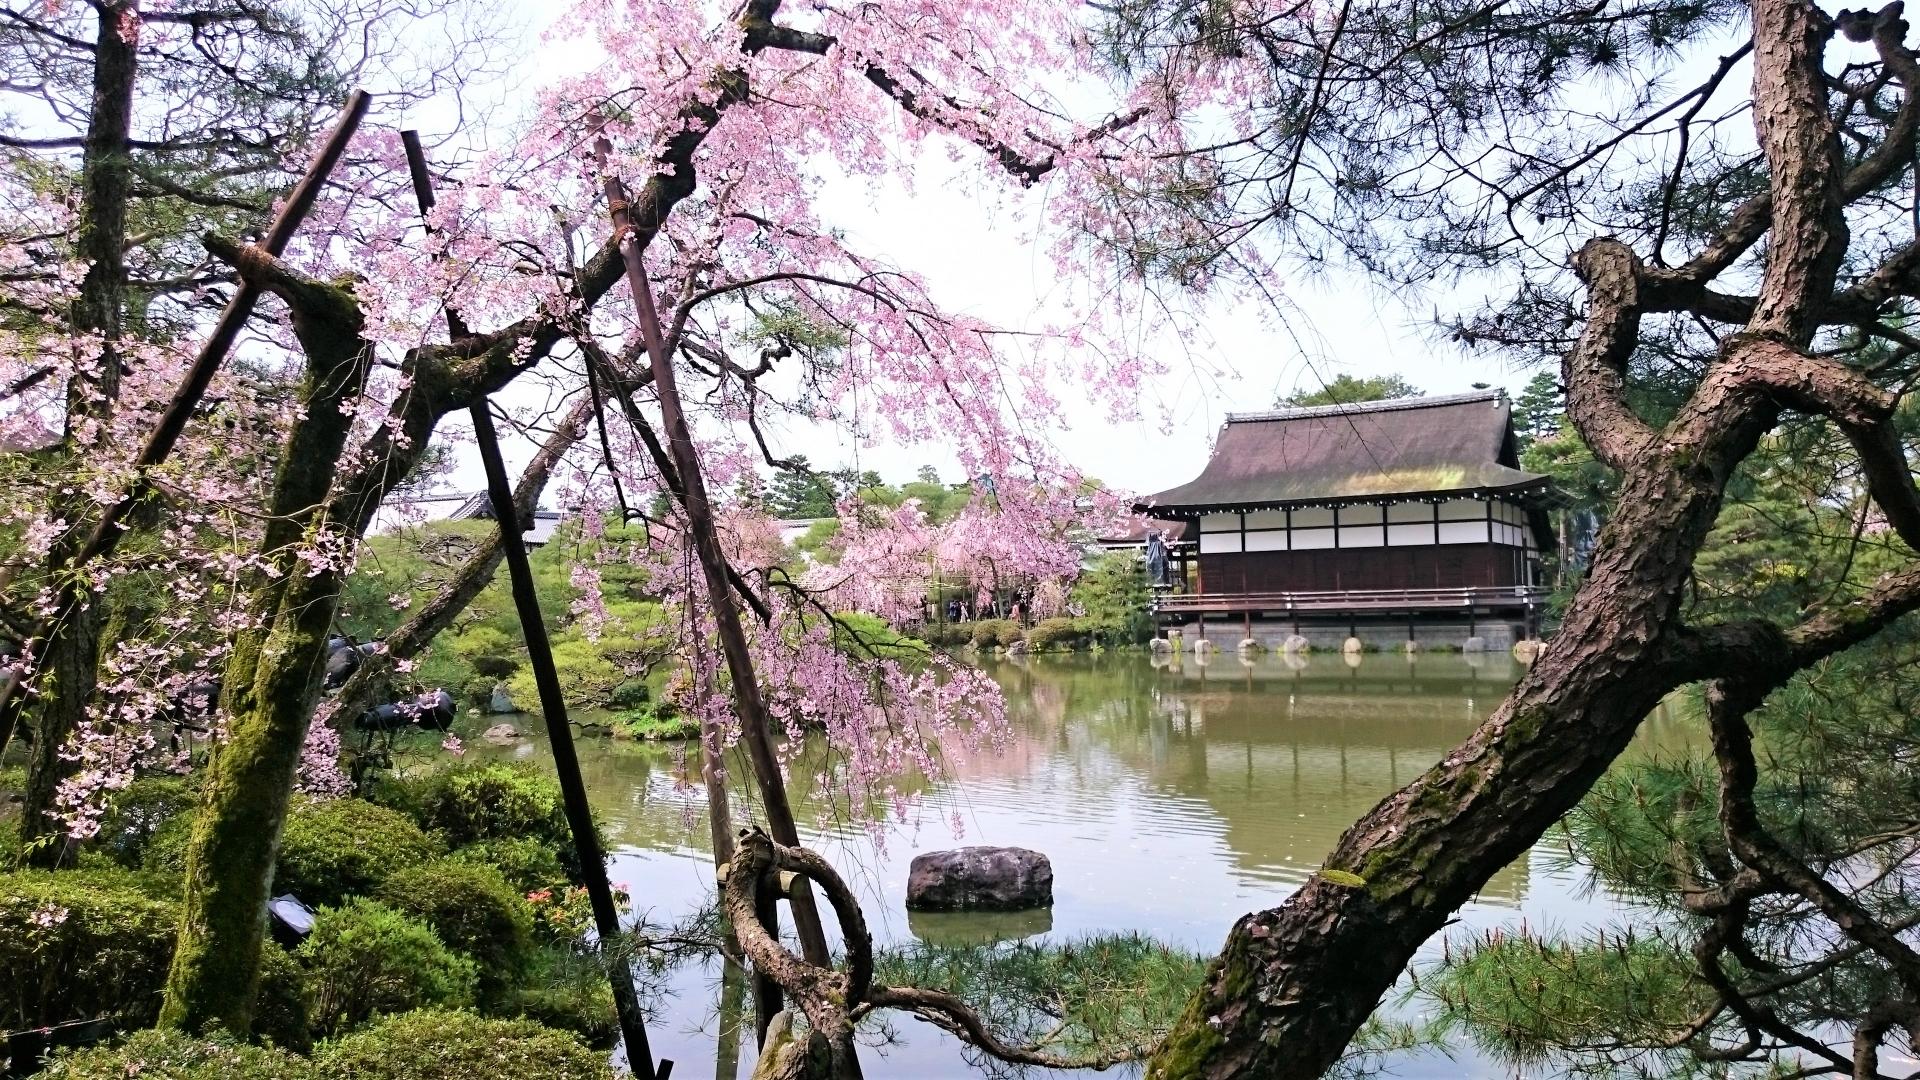 2619813_m 京都府 平安神宮(水面に映る桜の景色が美しい春におすすめ桜写真スポット! 撮影した写真の紹介、アクセス情報など)